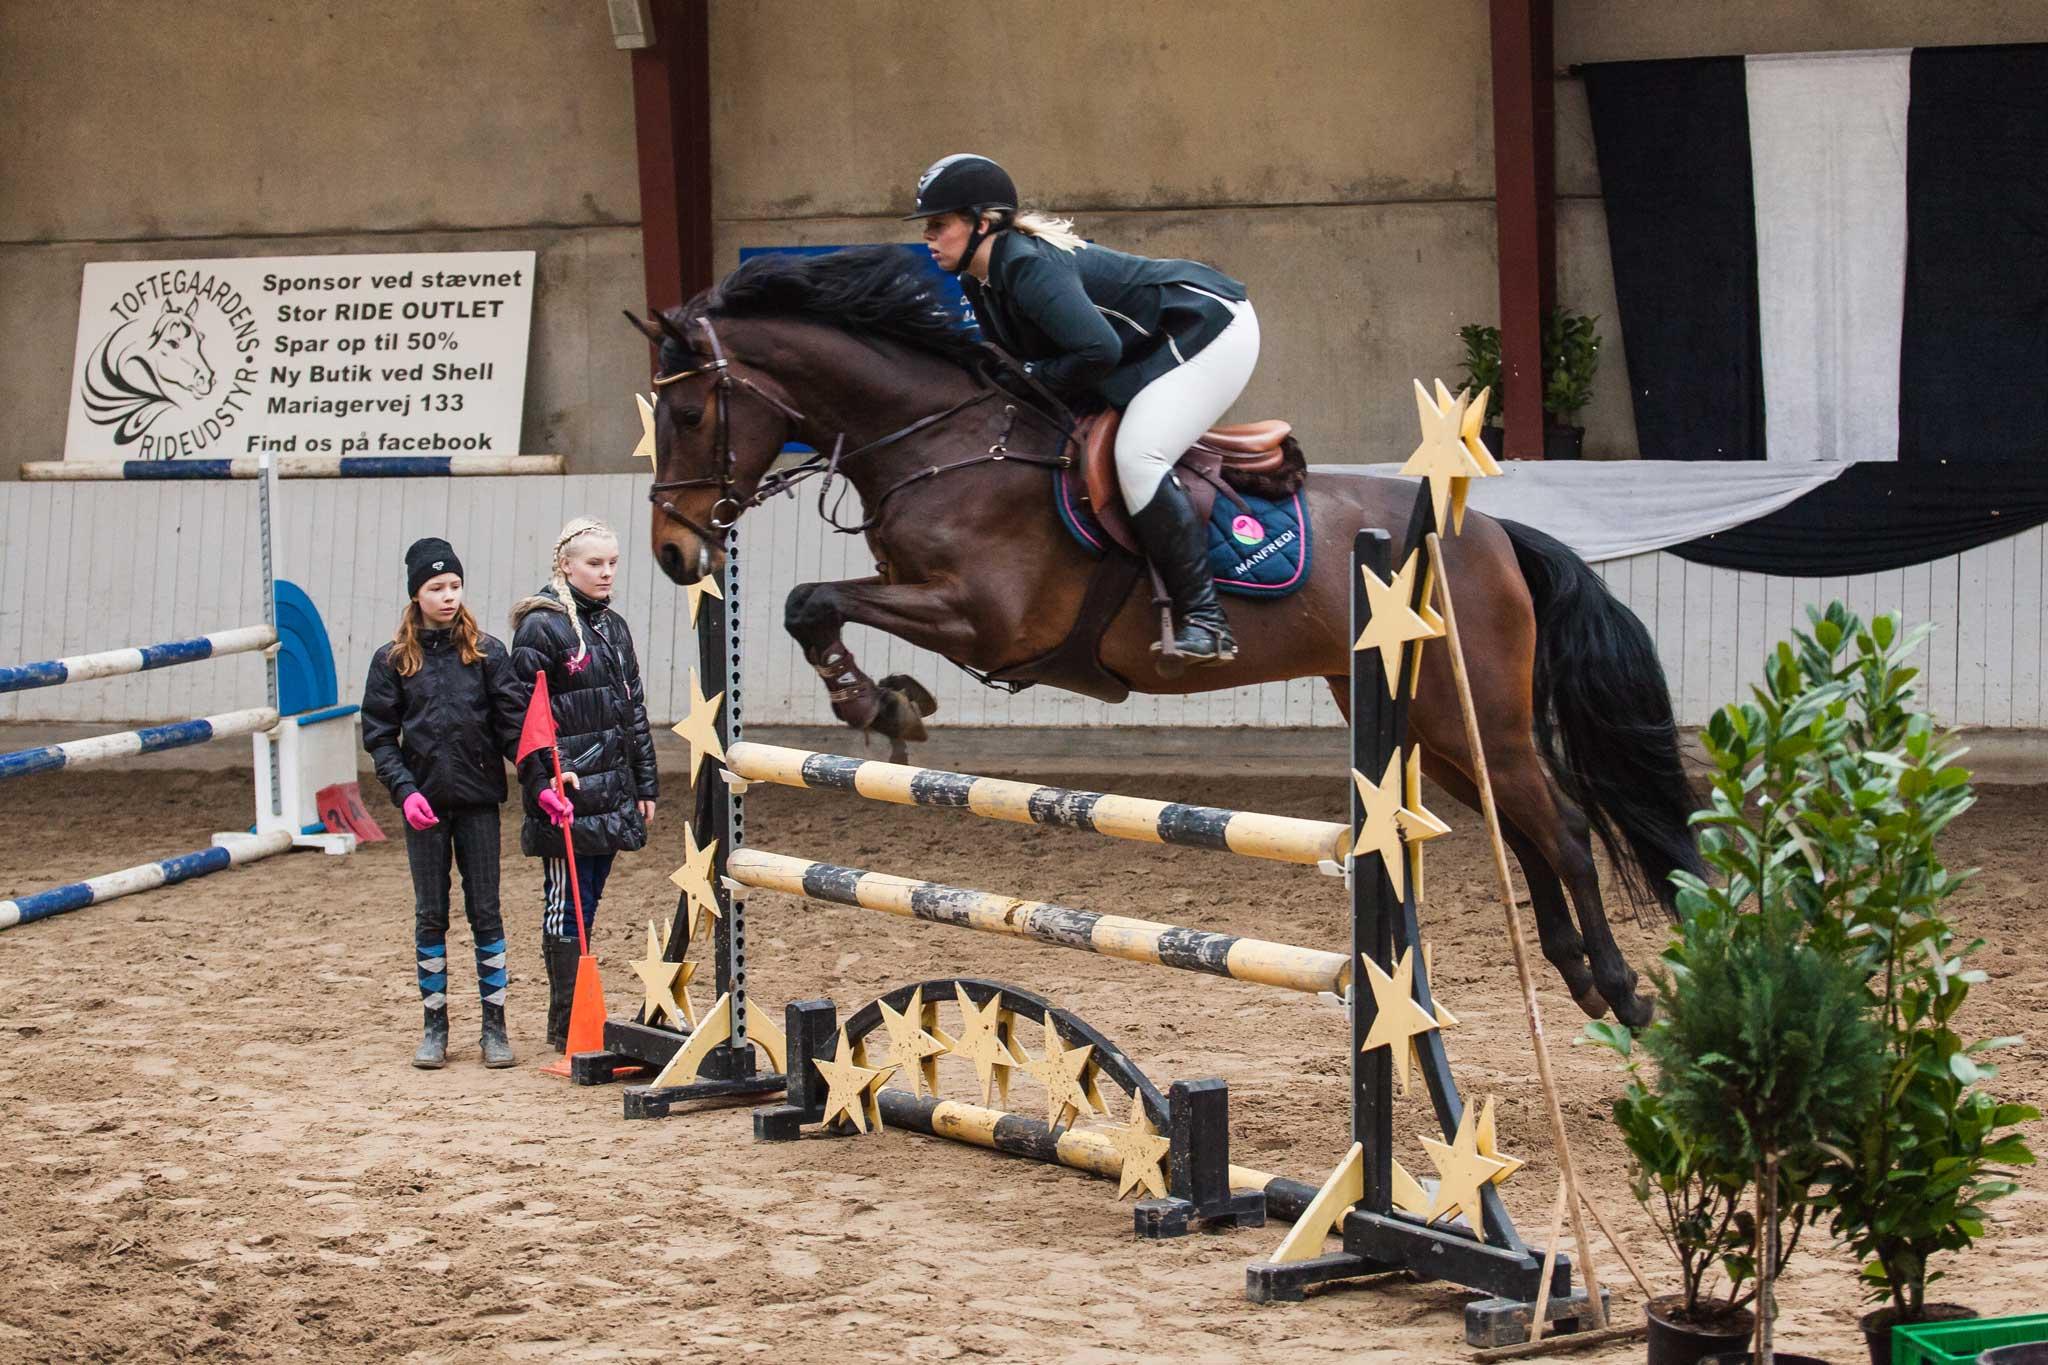 LB1--Springning-Heste-(105-cm)-B0